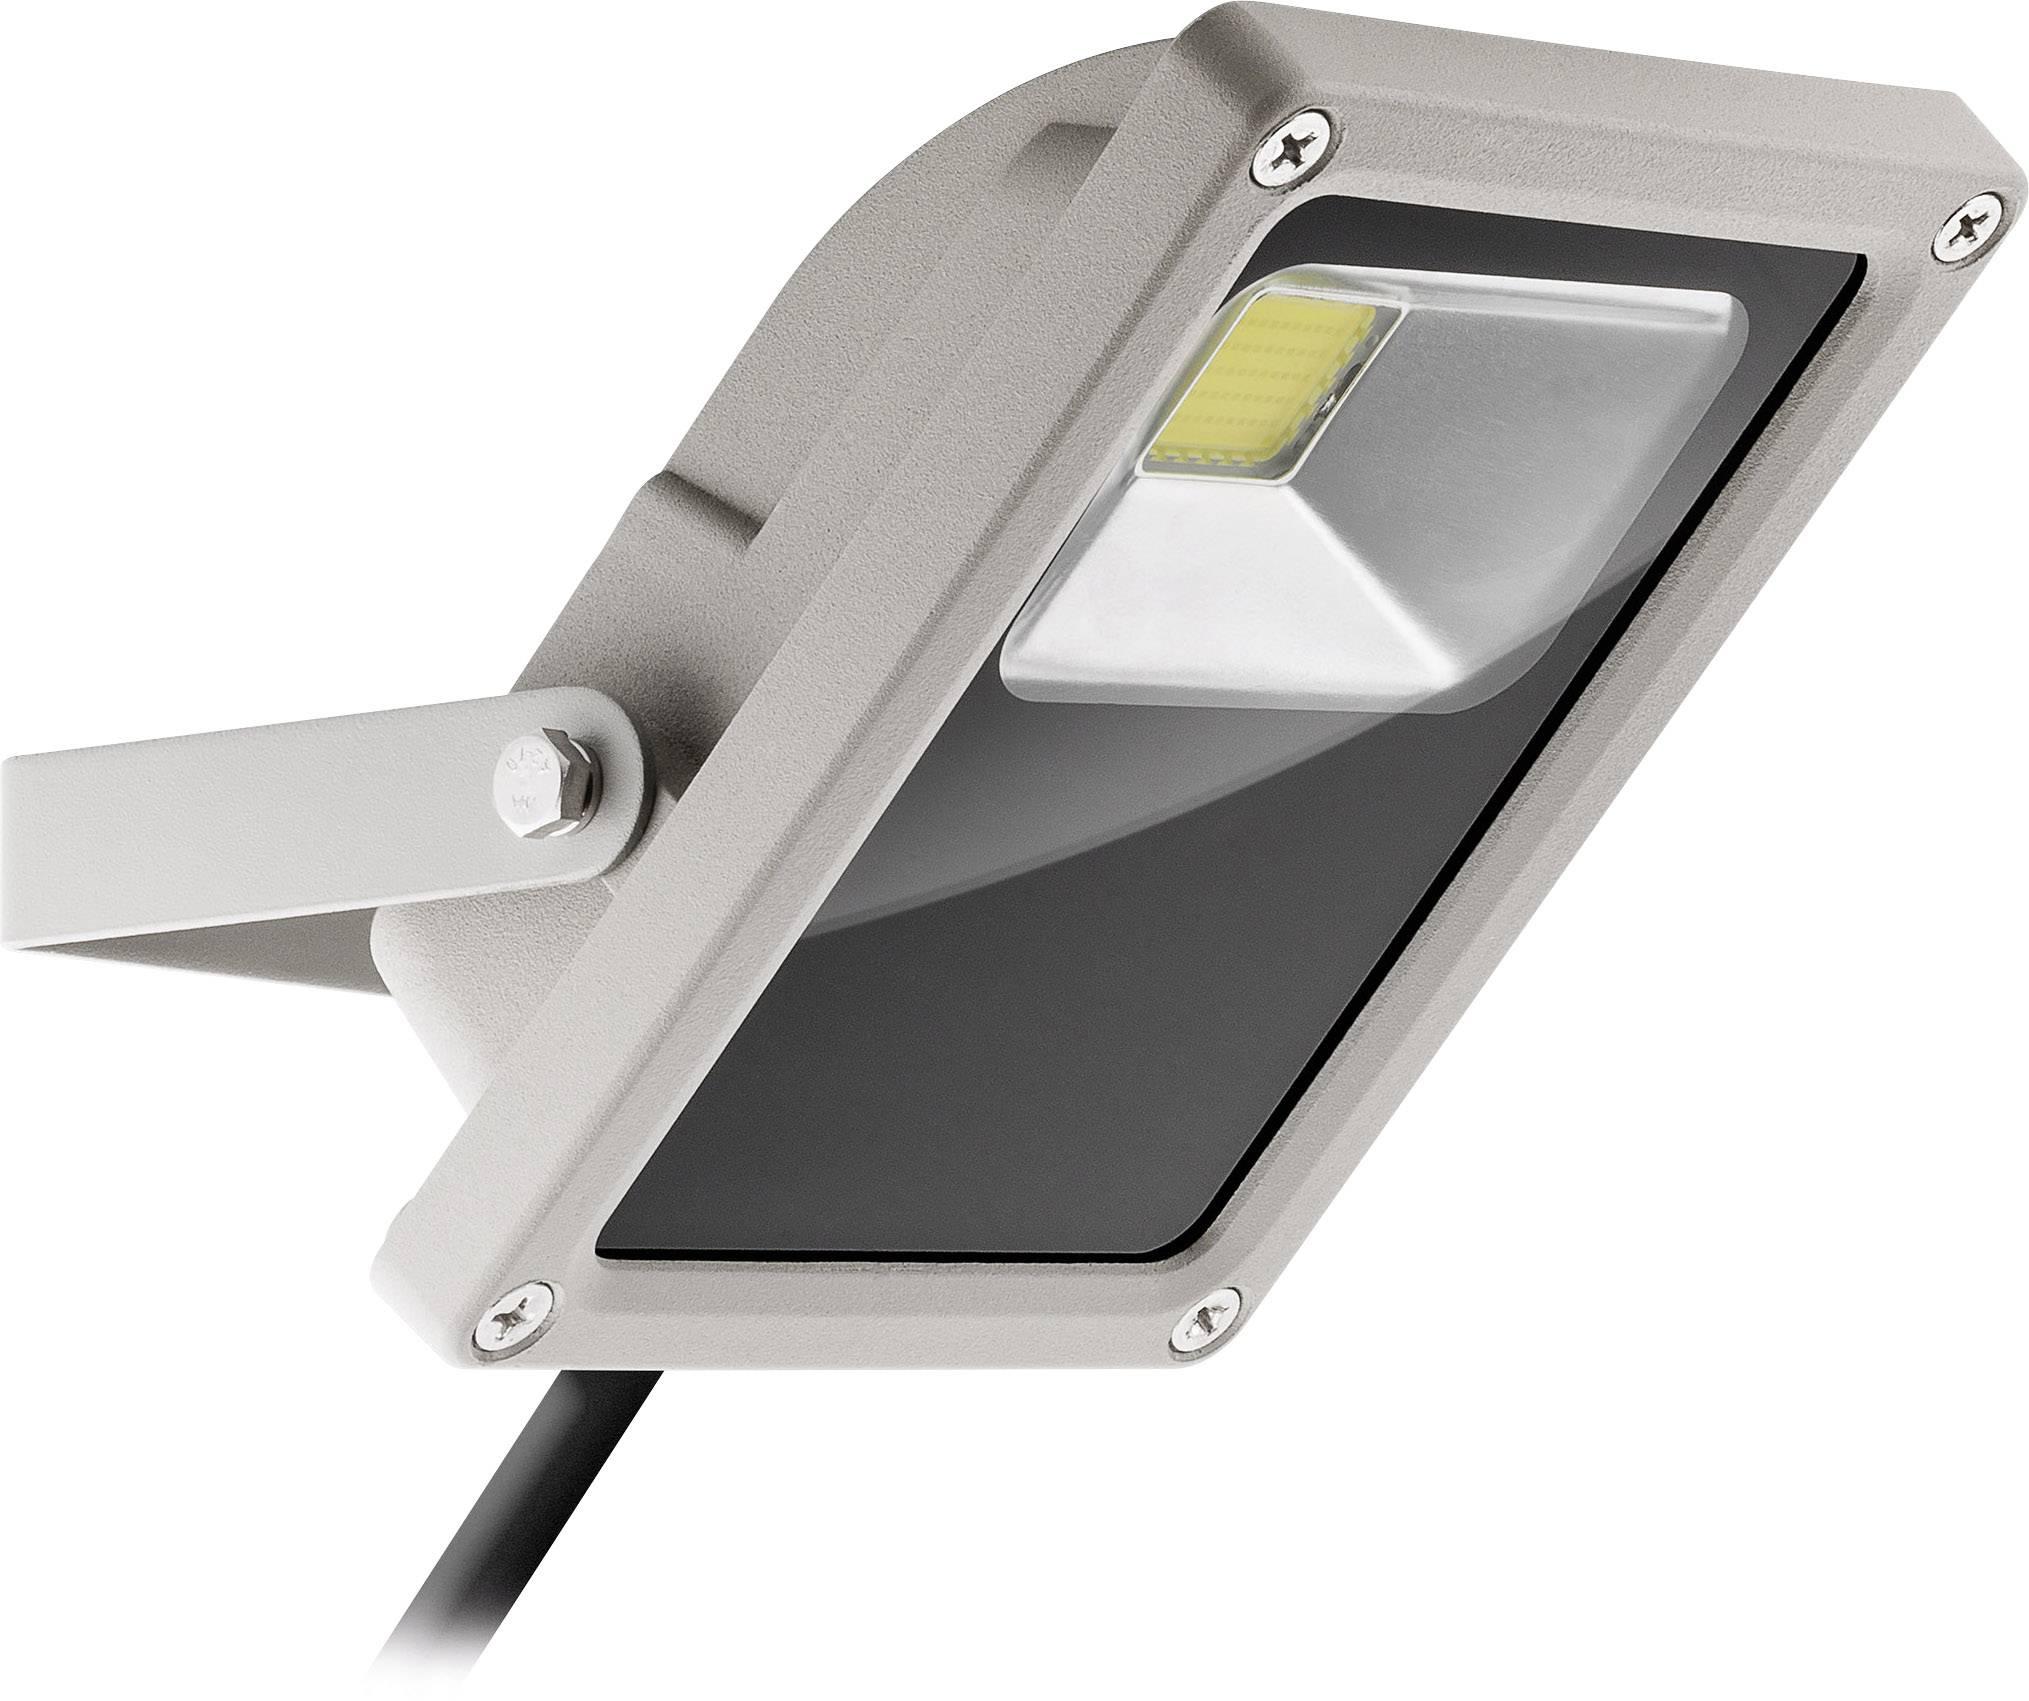 LED vonkajšie relektor Goobay 30642, 15 W, teplá biela